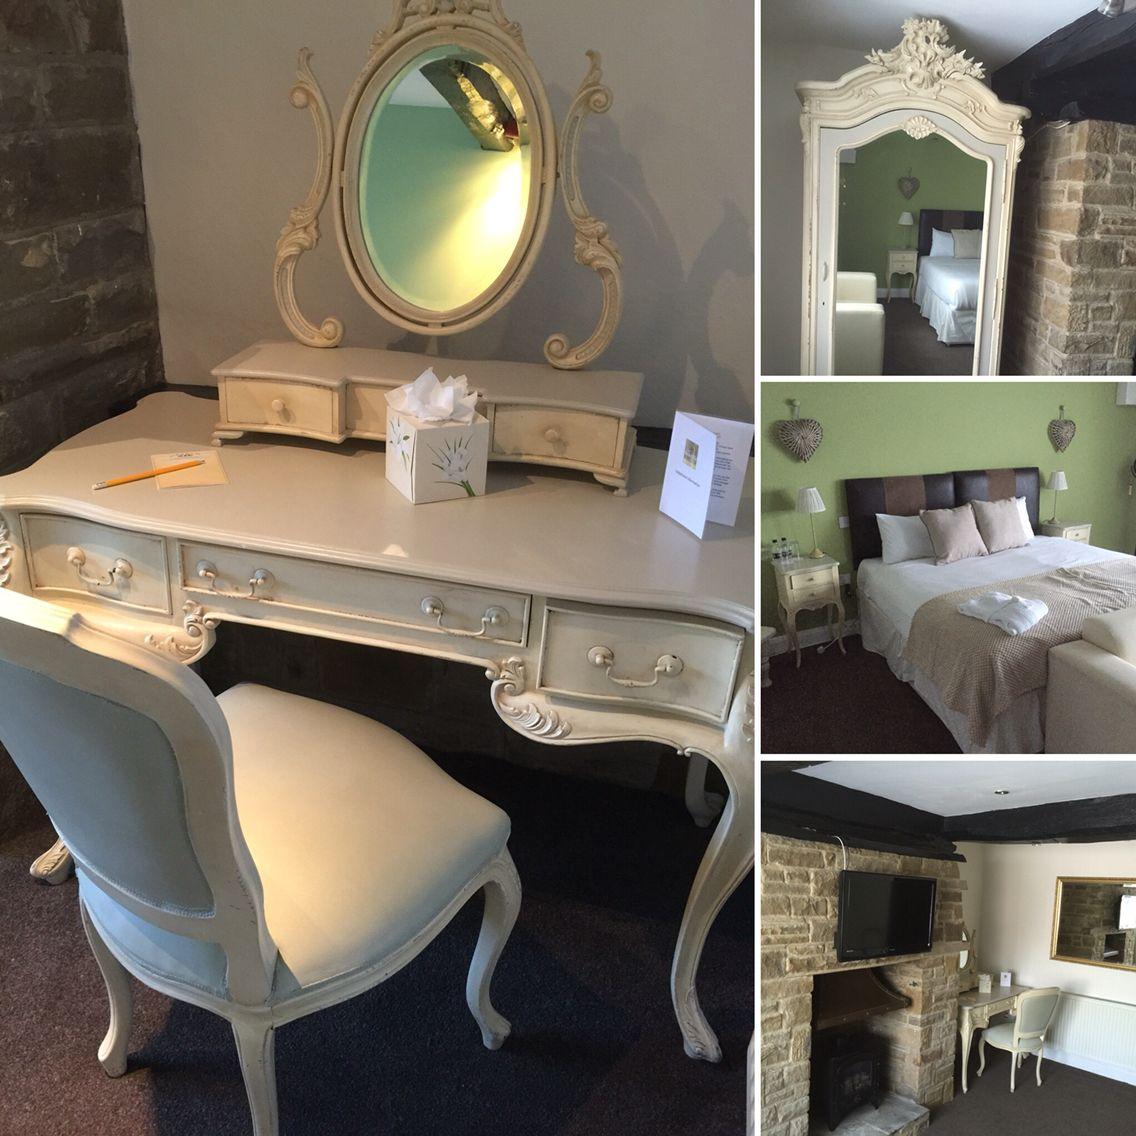 Corporate room makeover for The Black Horse Inn, Clifton.